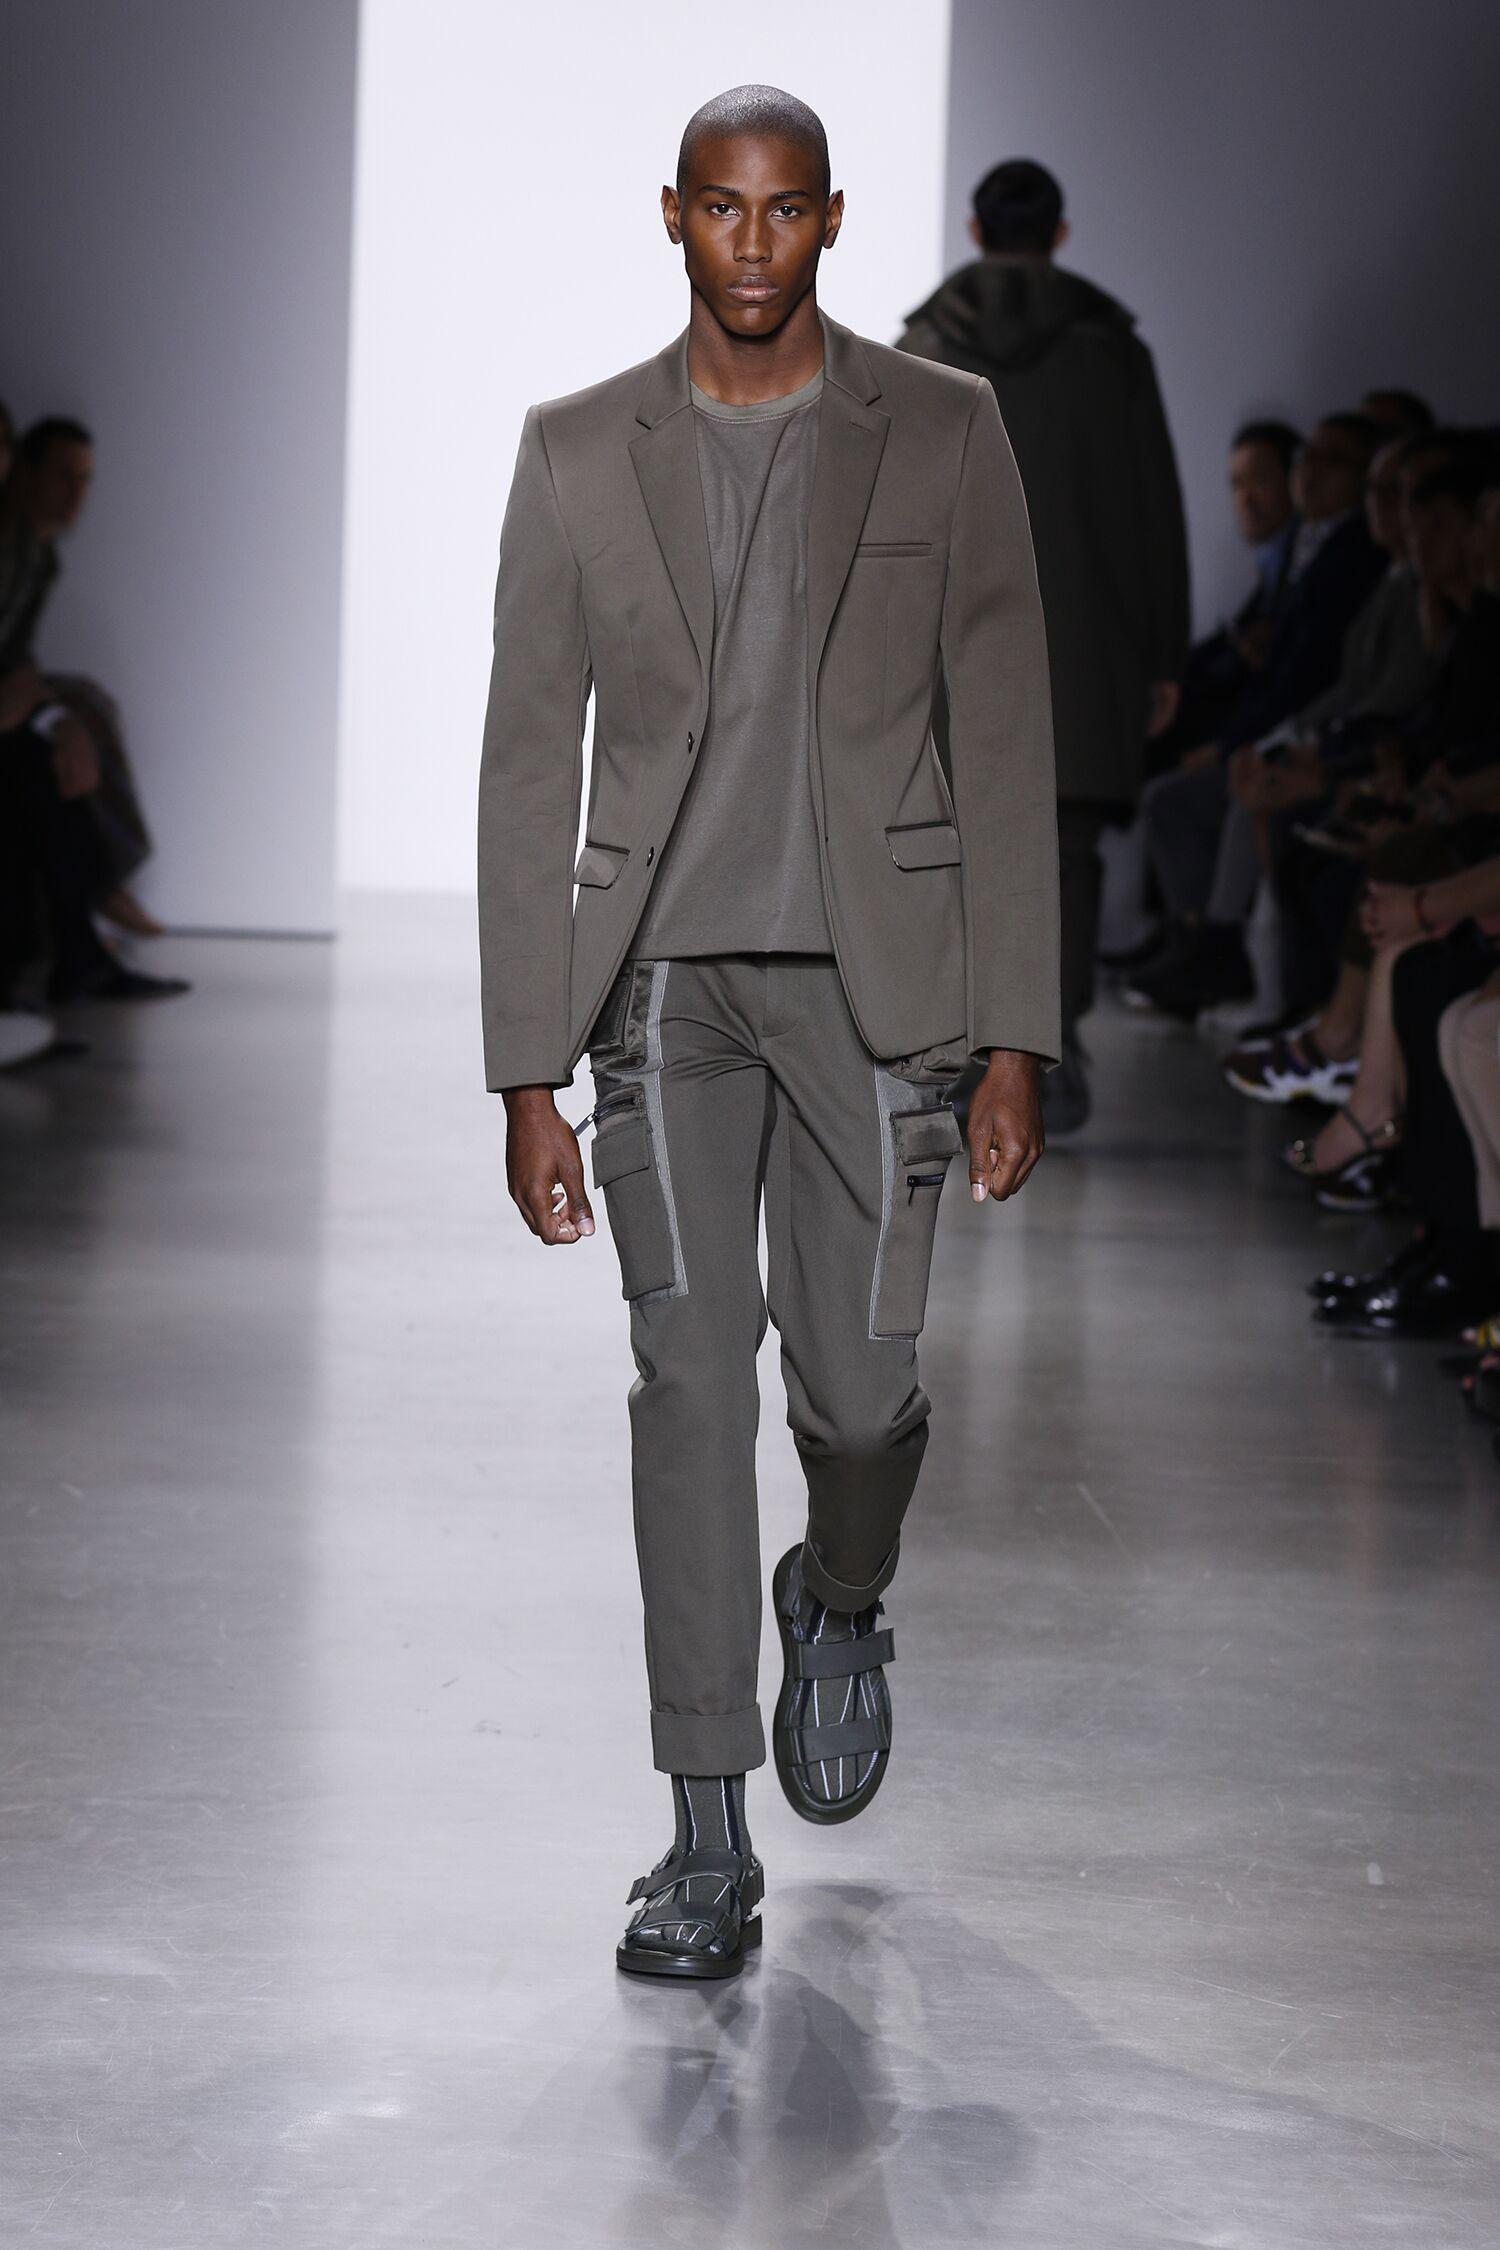 2016 Fashion Man Model Calvin Klein Collection Catwalk